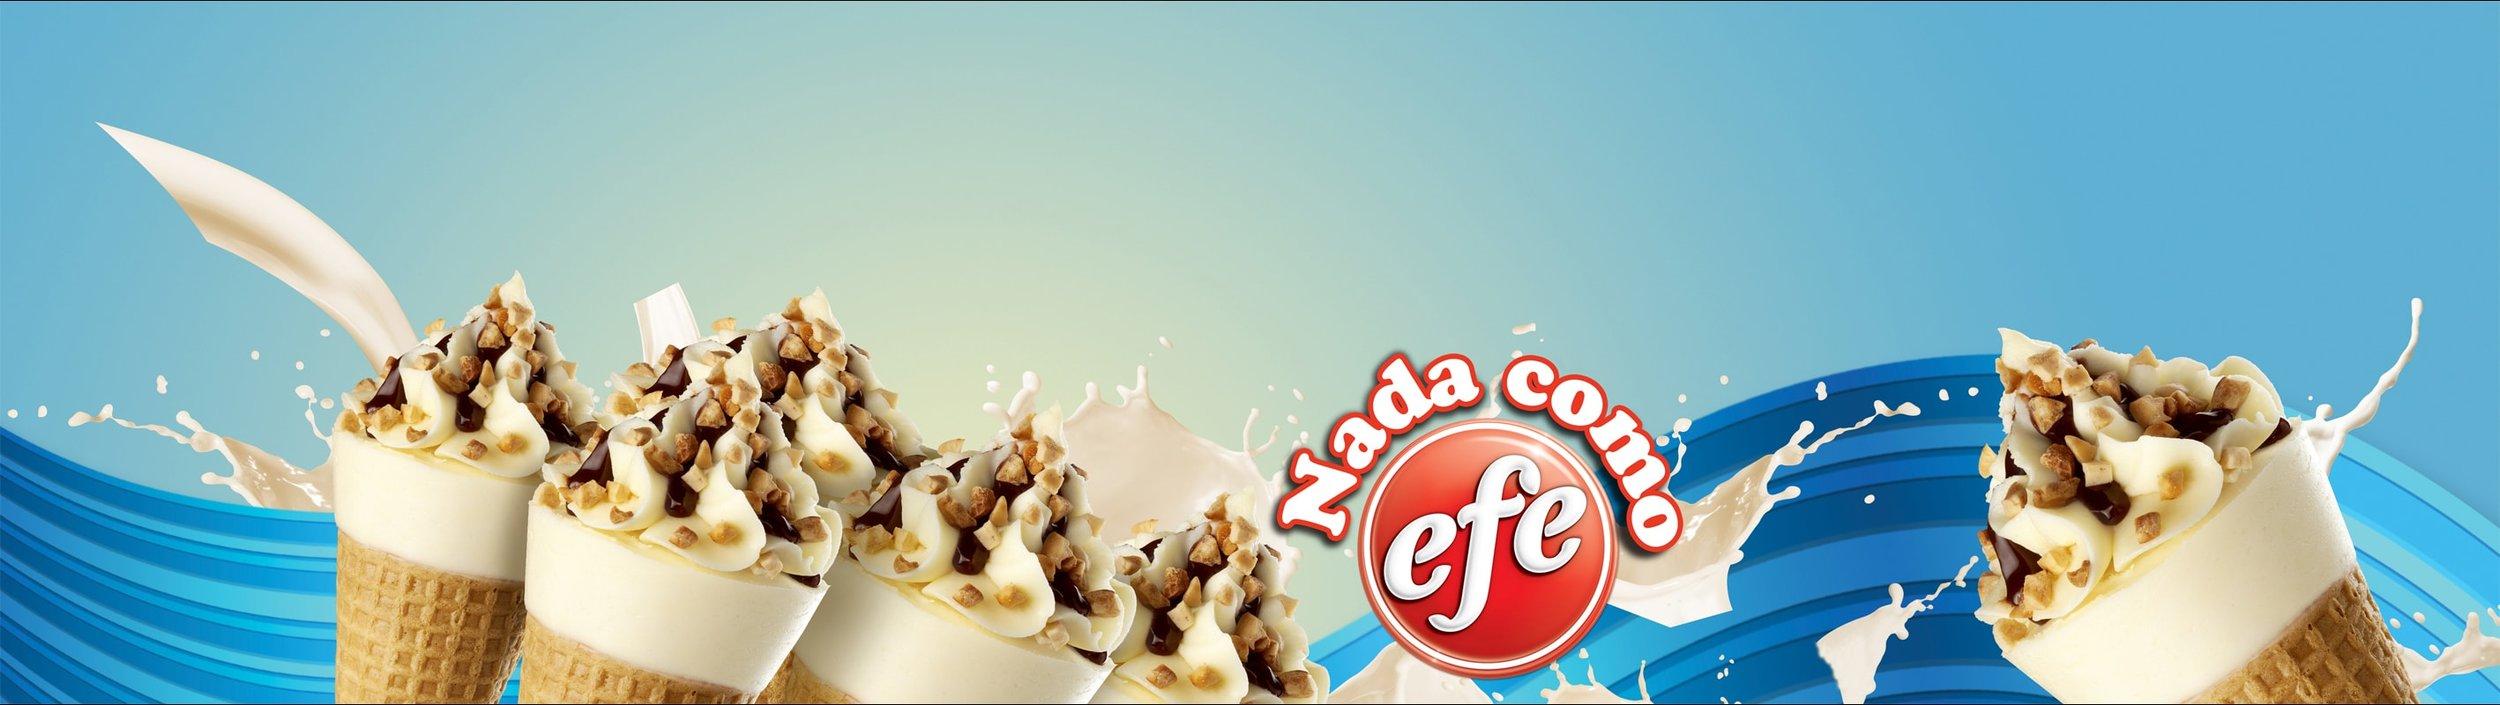 ice-cream-advertising-food-photography-miami-marcel-boldu.jpg